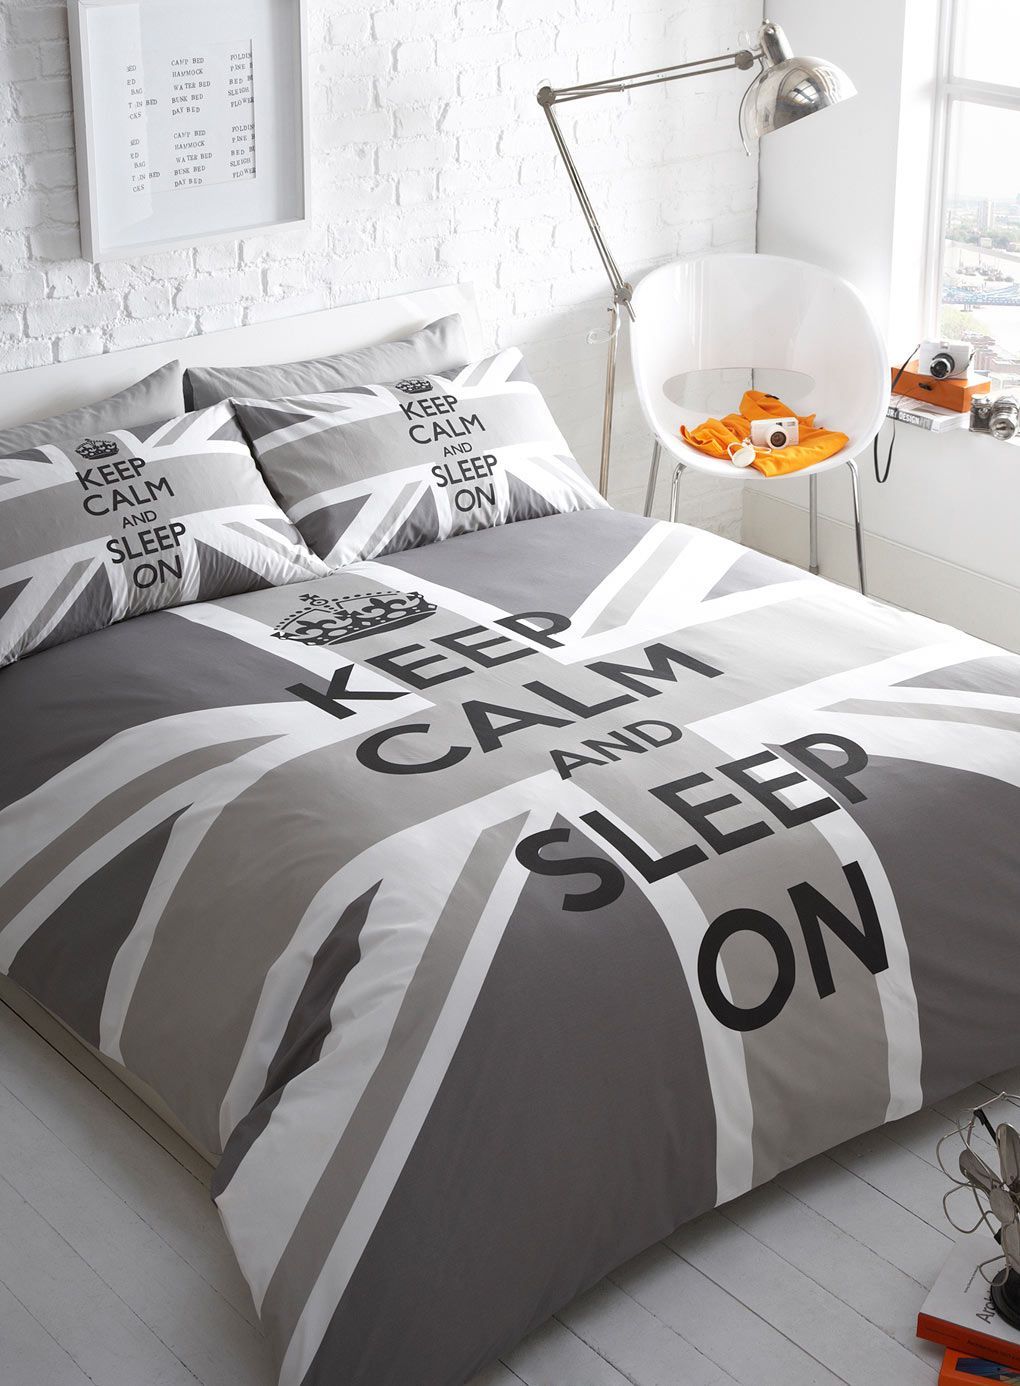 Keep Calm Bedding Bedding Set Apartment Decor Bedroom